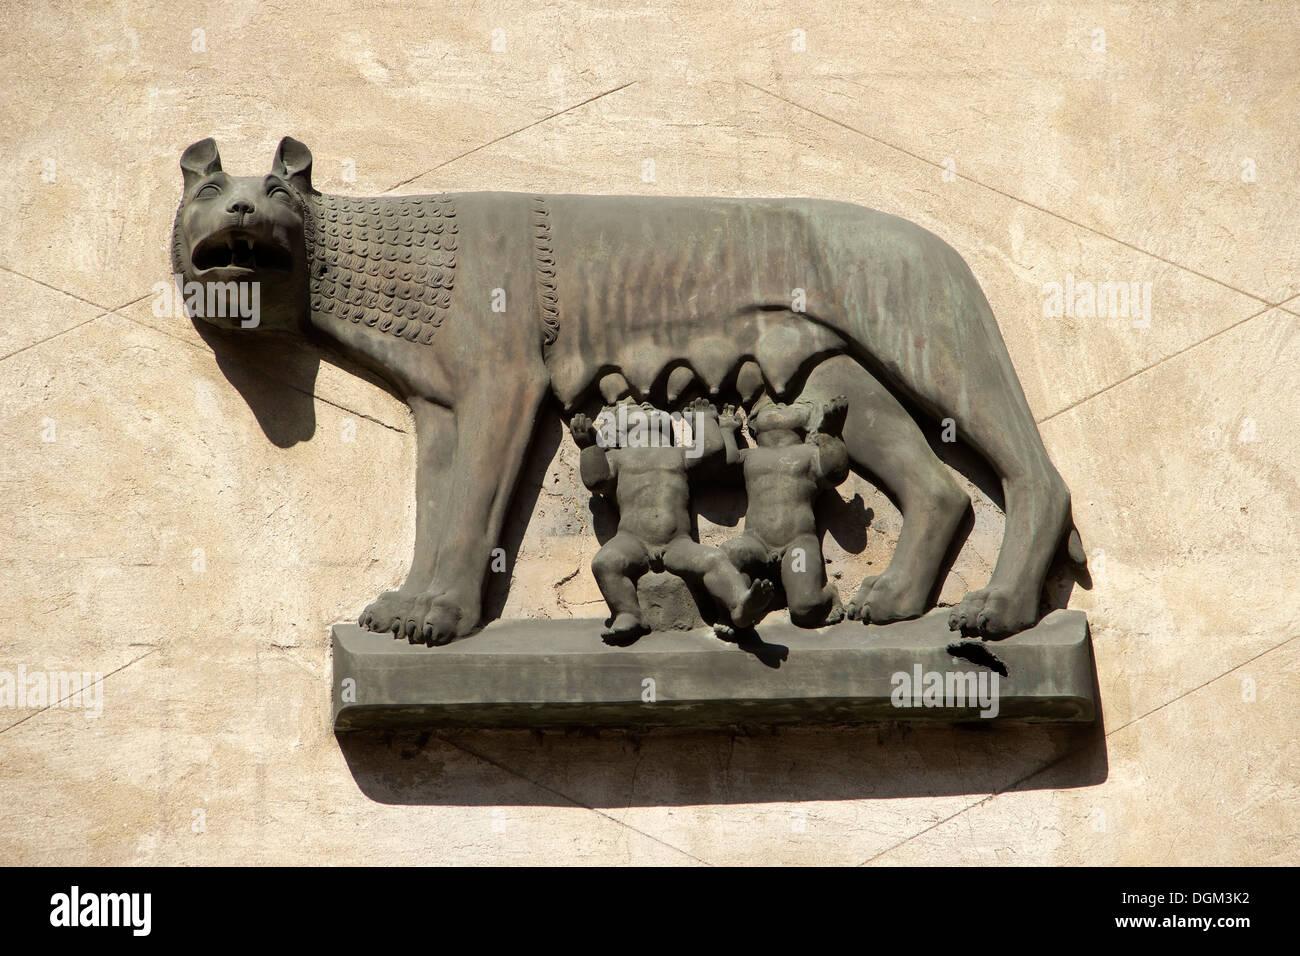 Via Mazzini in Verona - Italy - Stock Image